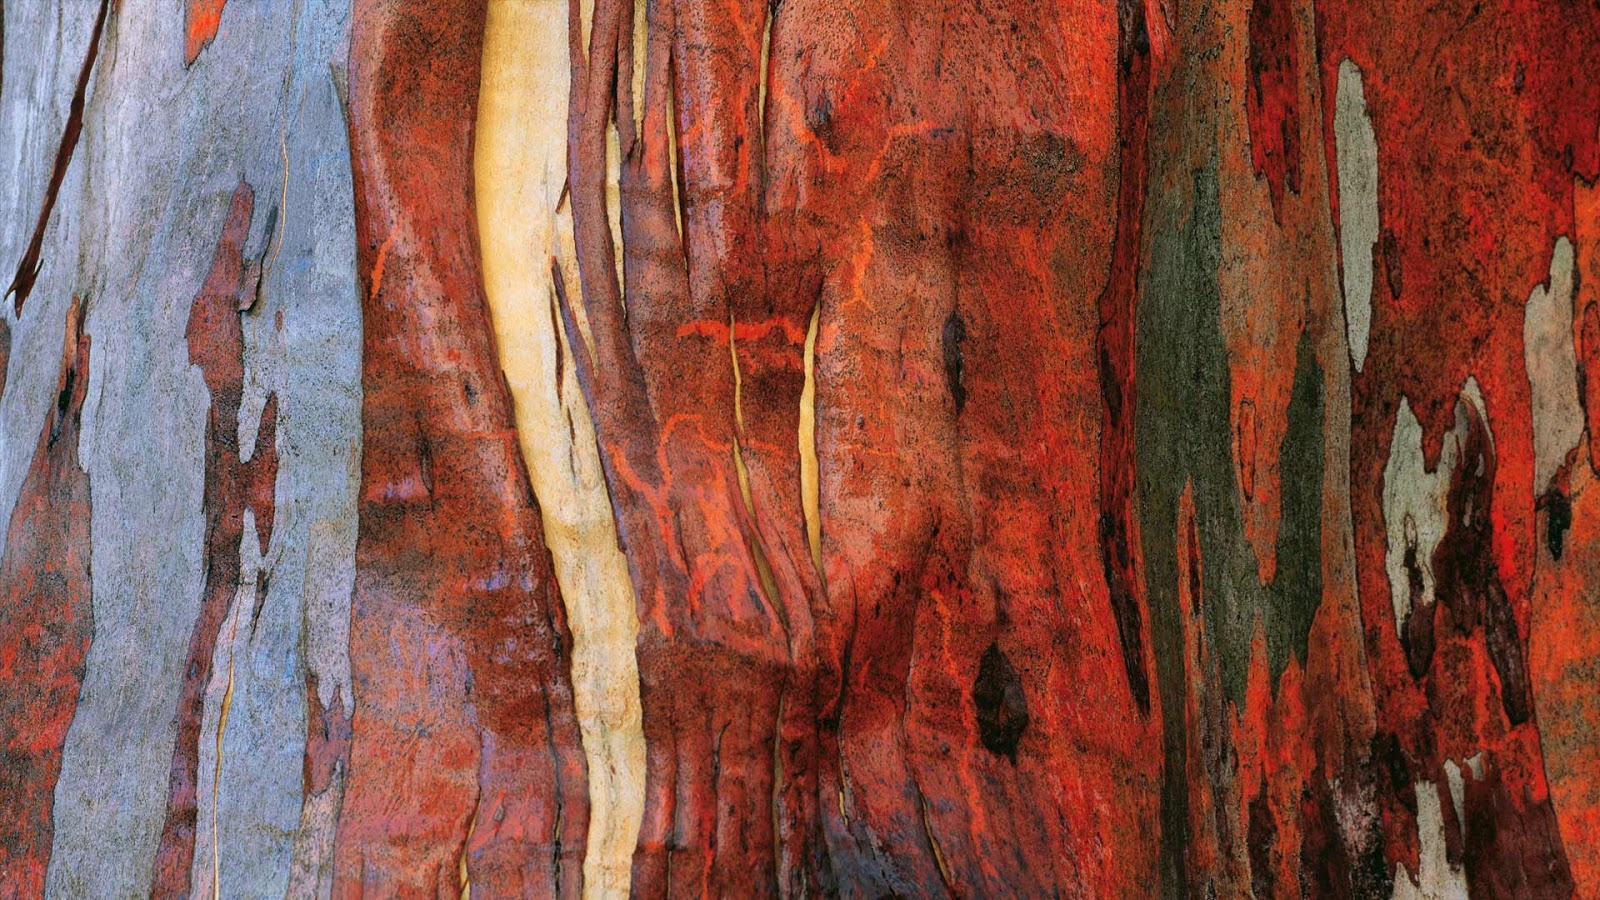 Alpine eucalypt bark in Tasmania, Australia © Australian Scenics/Getty Images